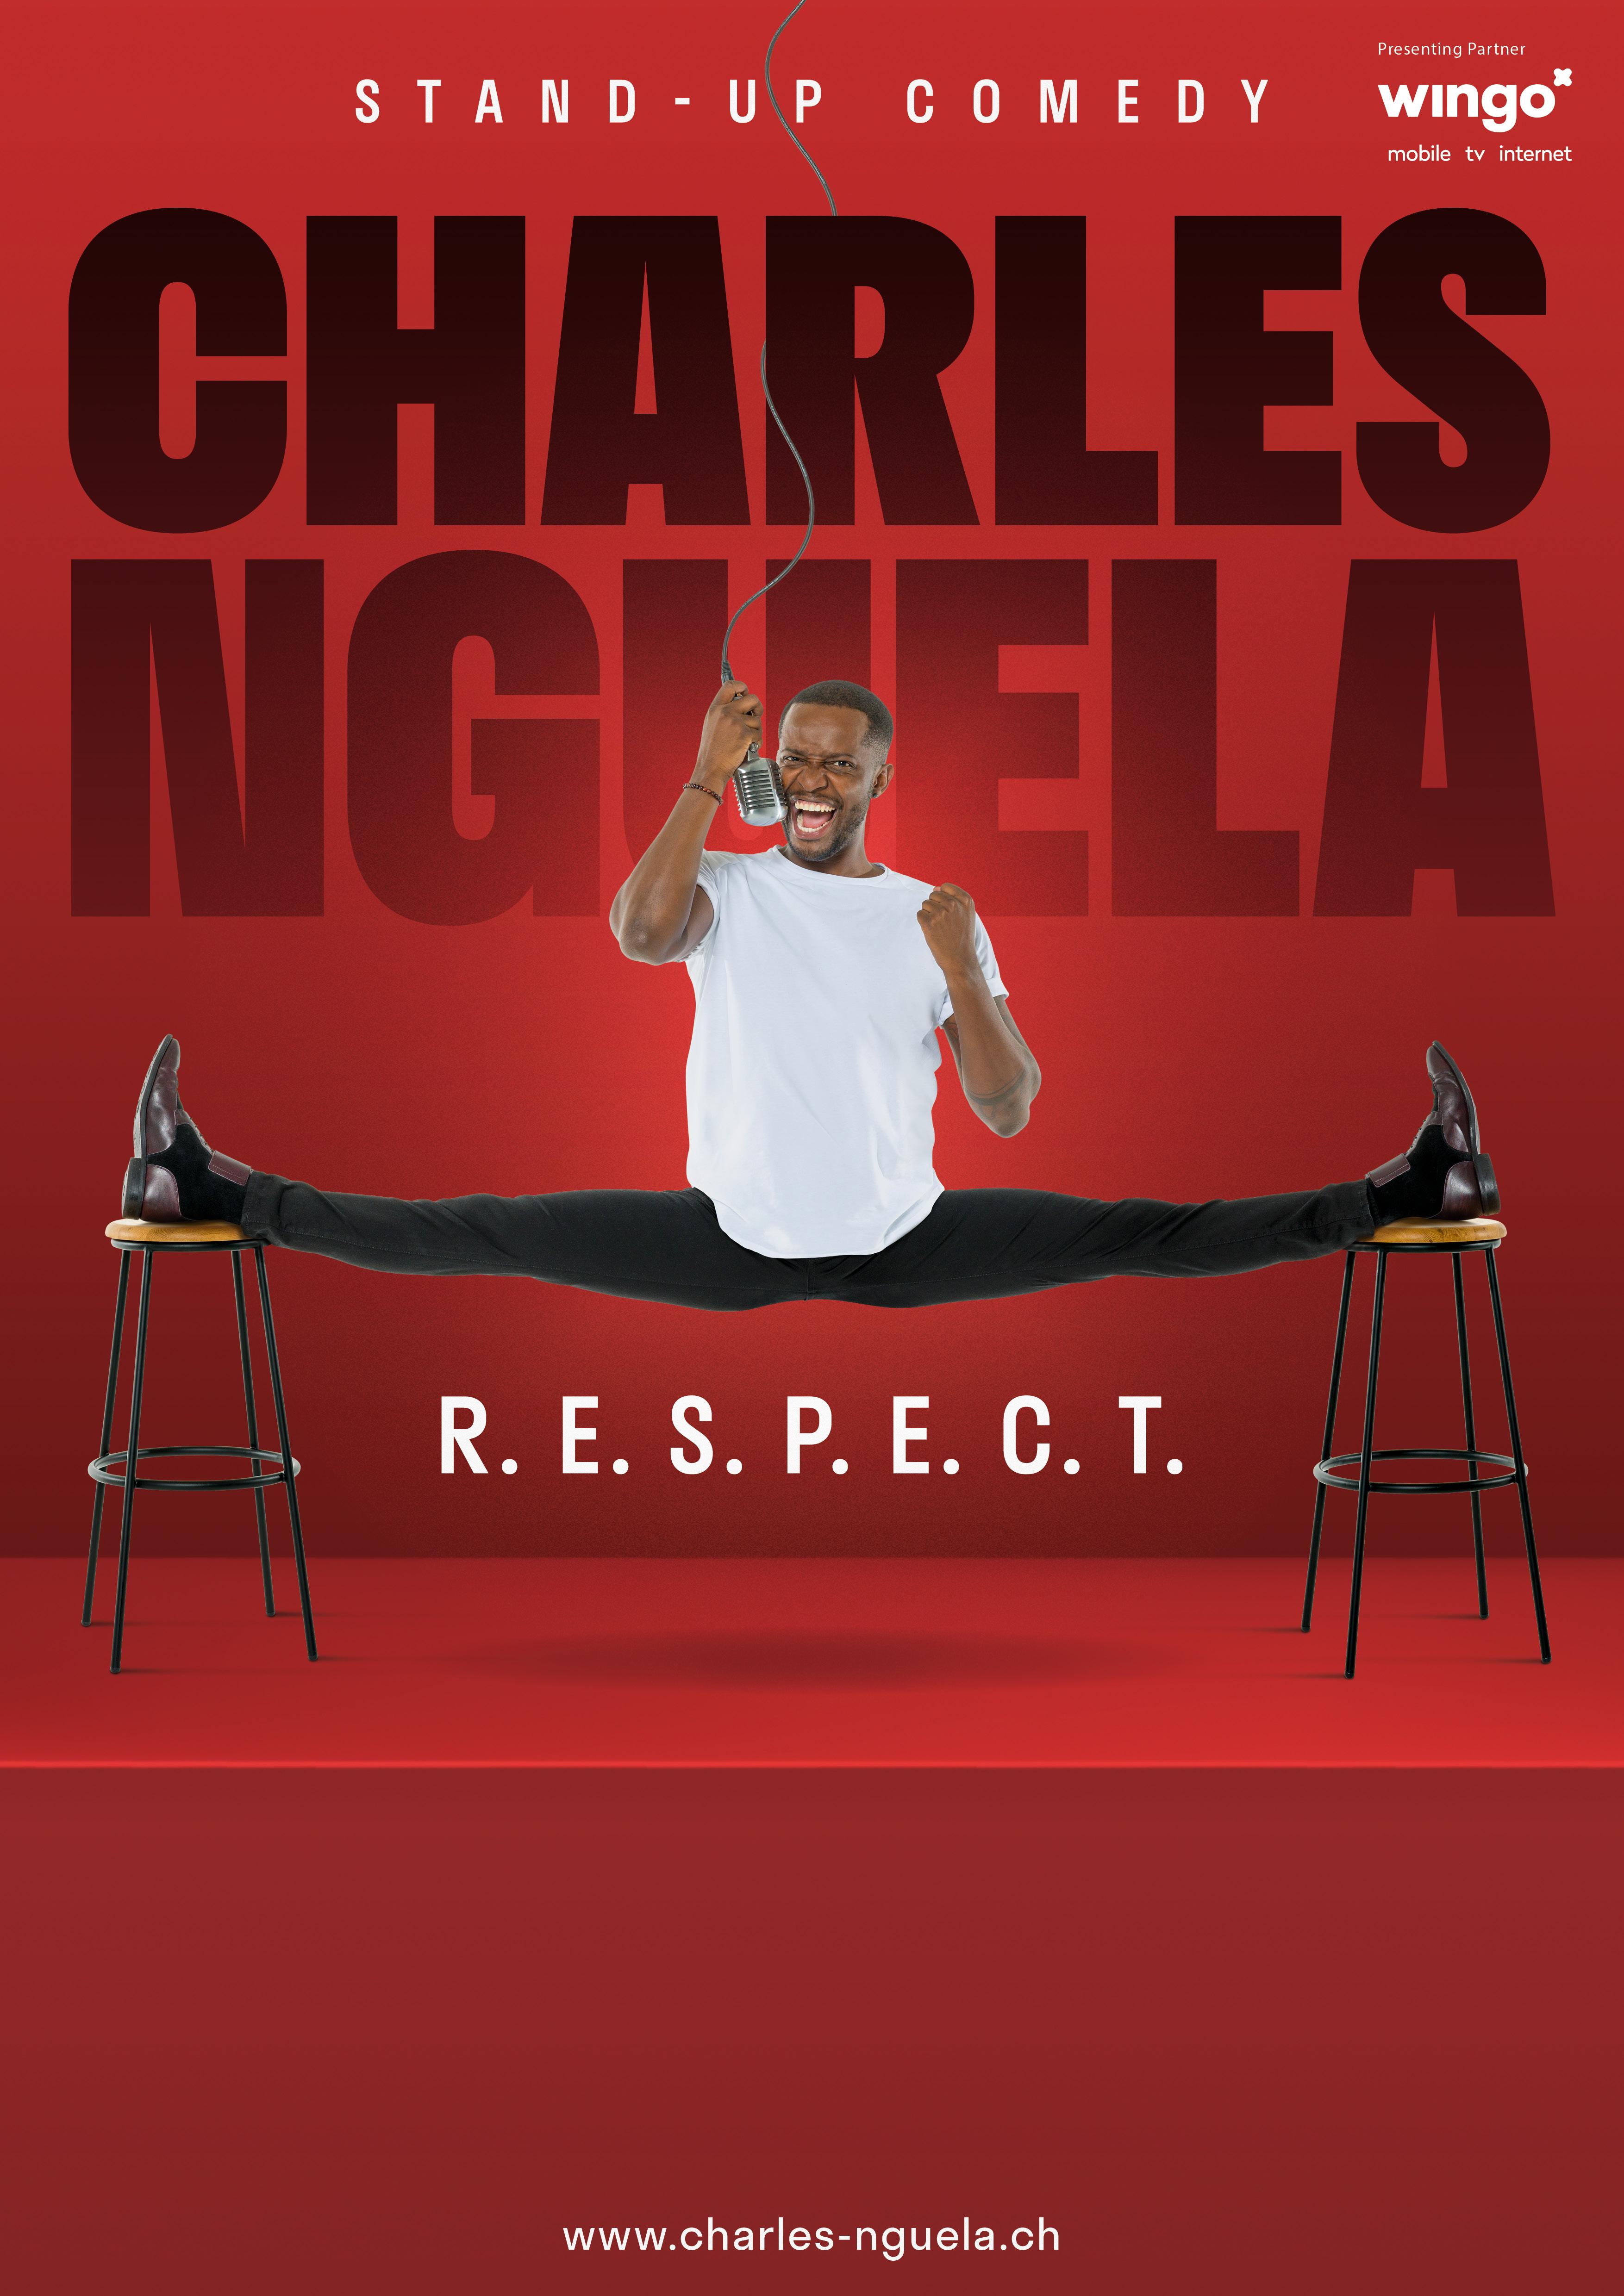 Charles Nguela - R.E.S.P.E.C.T.